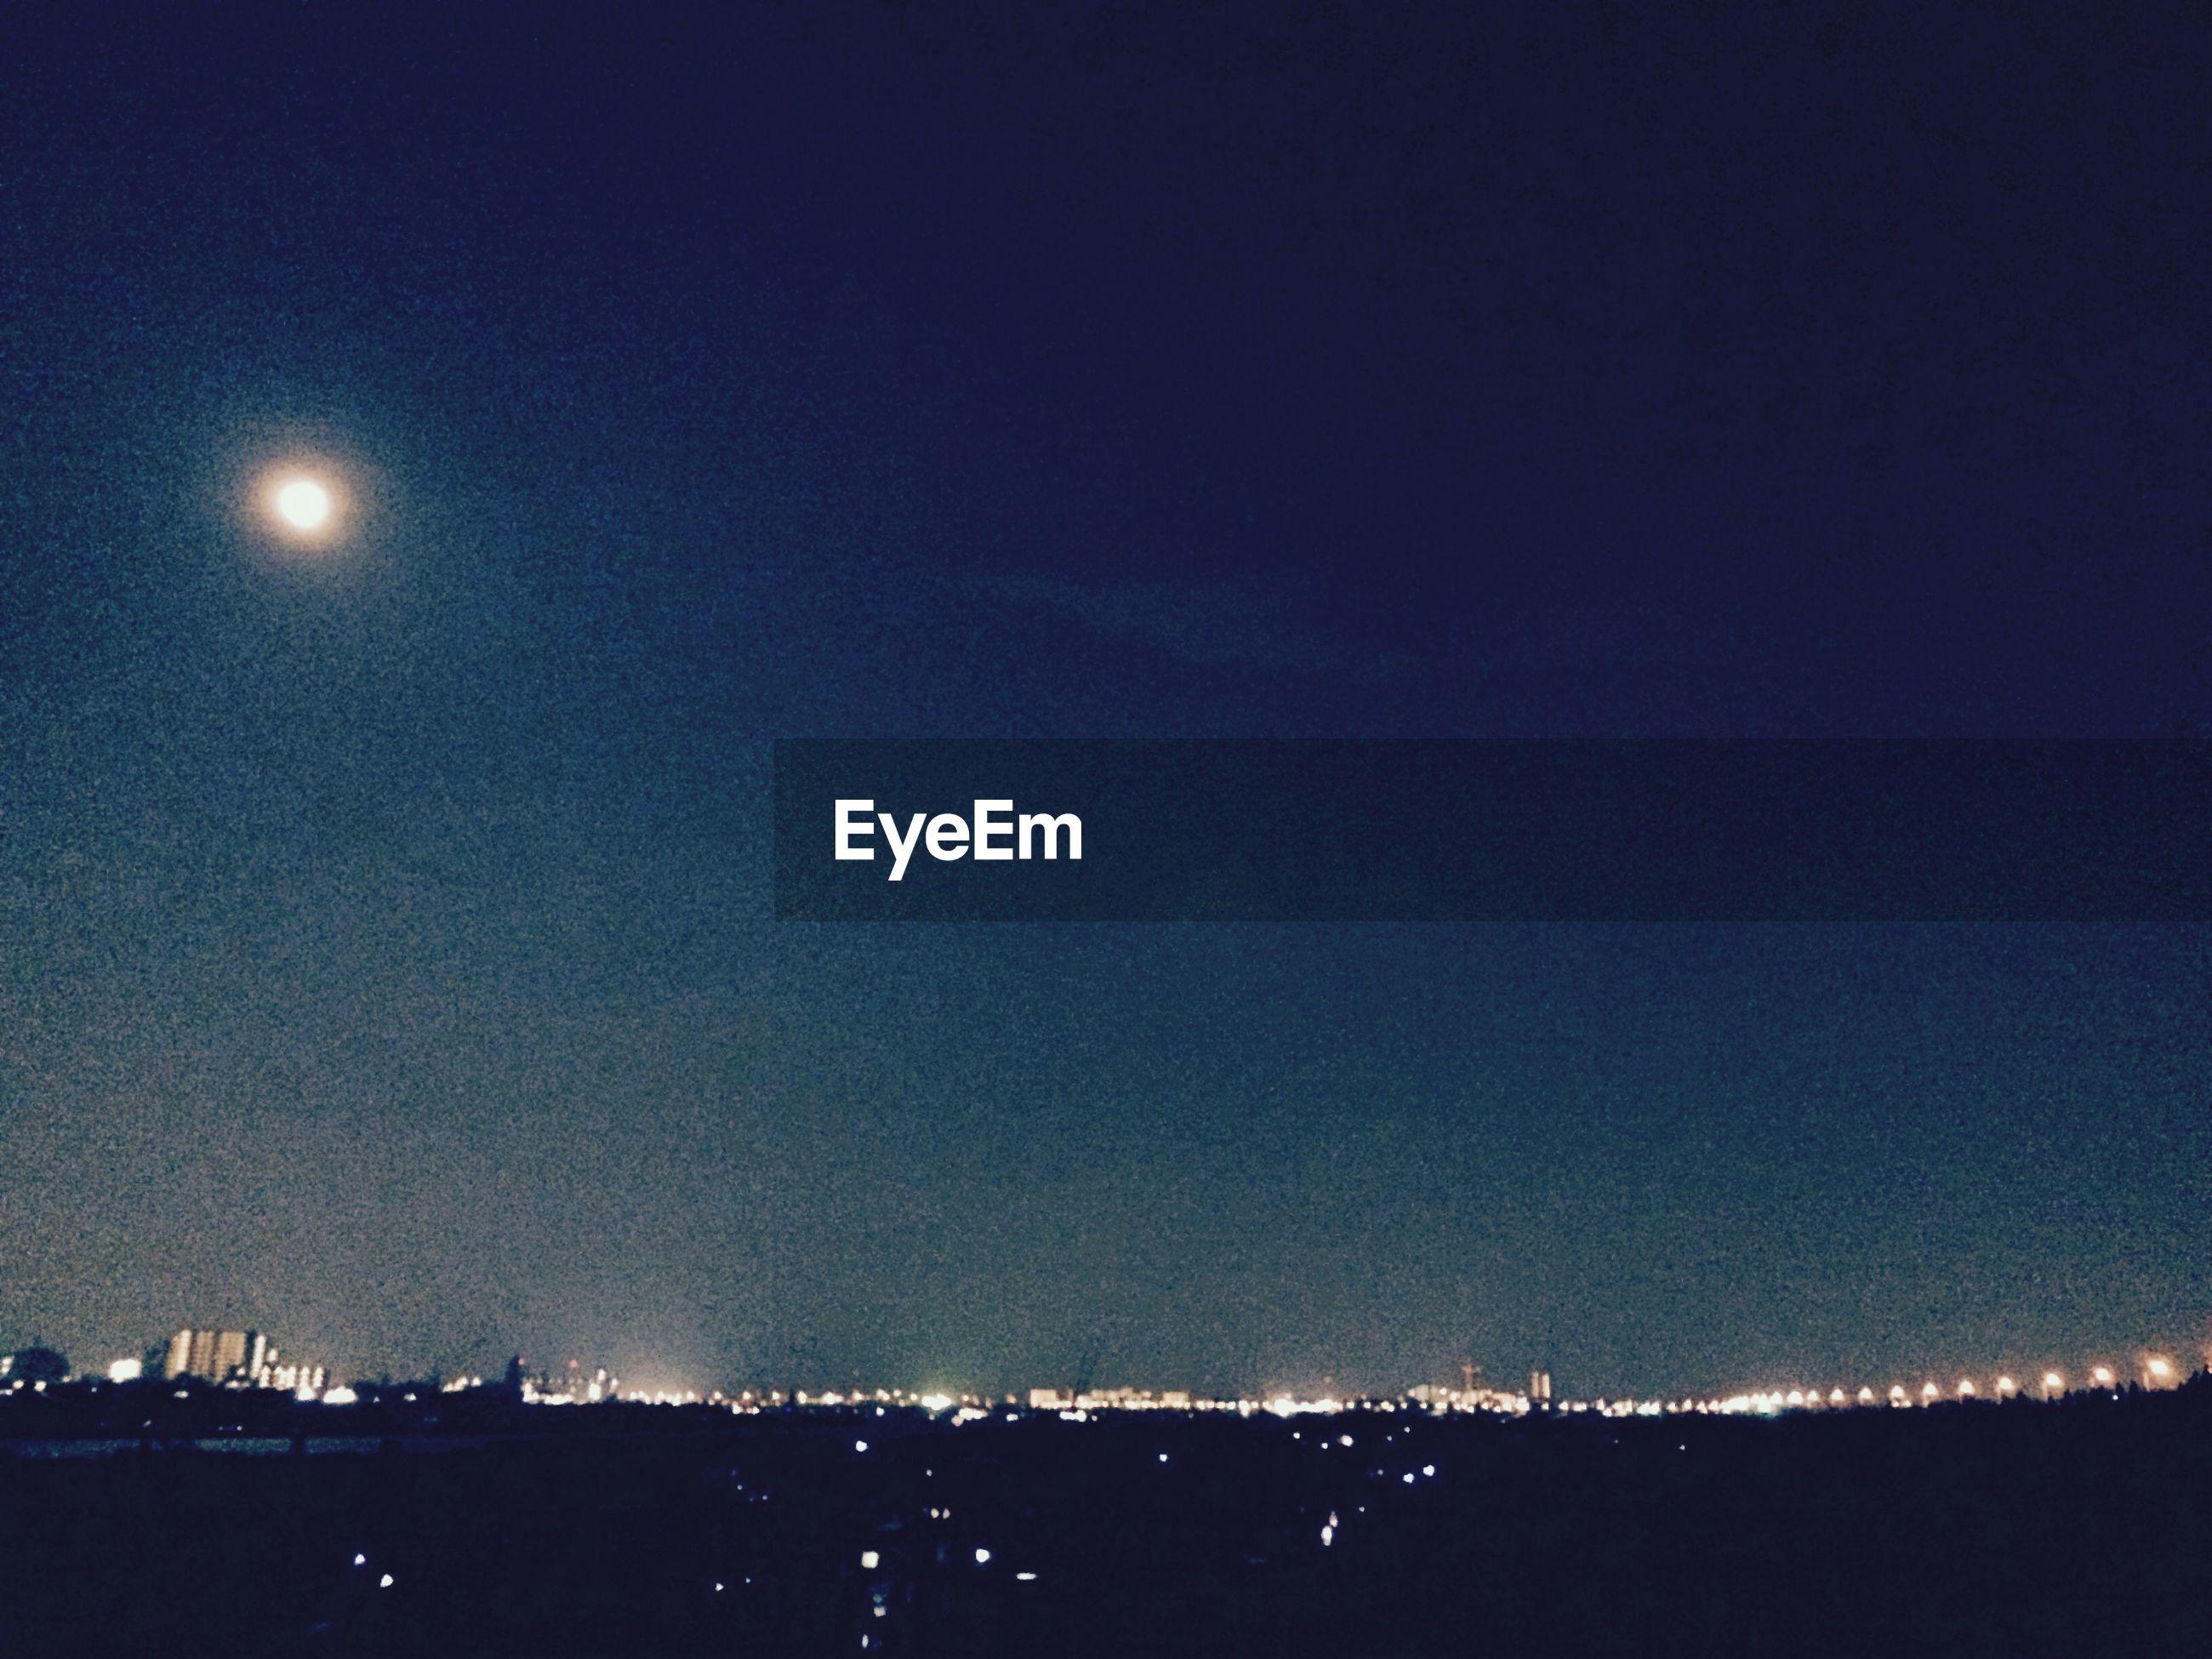 night, illuminated, moon, copy space, scenics, clear sky, sky, beauty in nature, tranquil scene, blue, full moon, tranquility, nature, light, dark, idyllic, dusk, astronomy, outdoors, cityscape